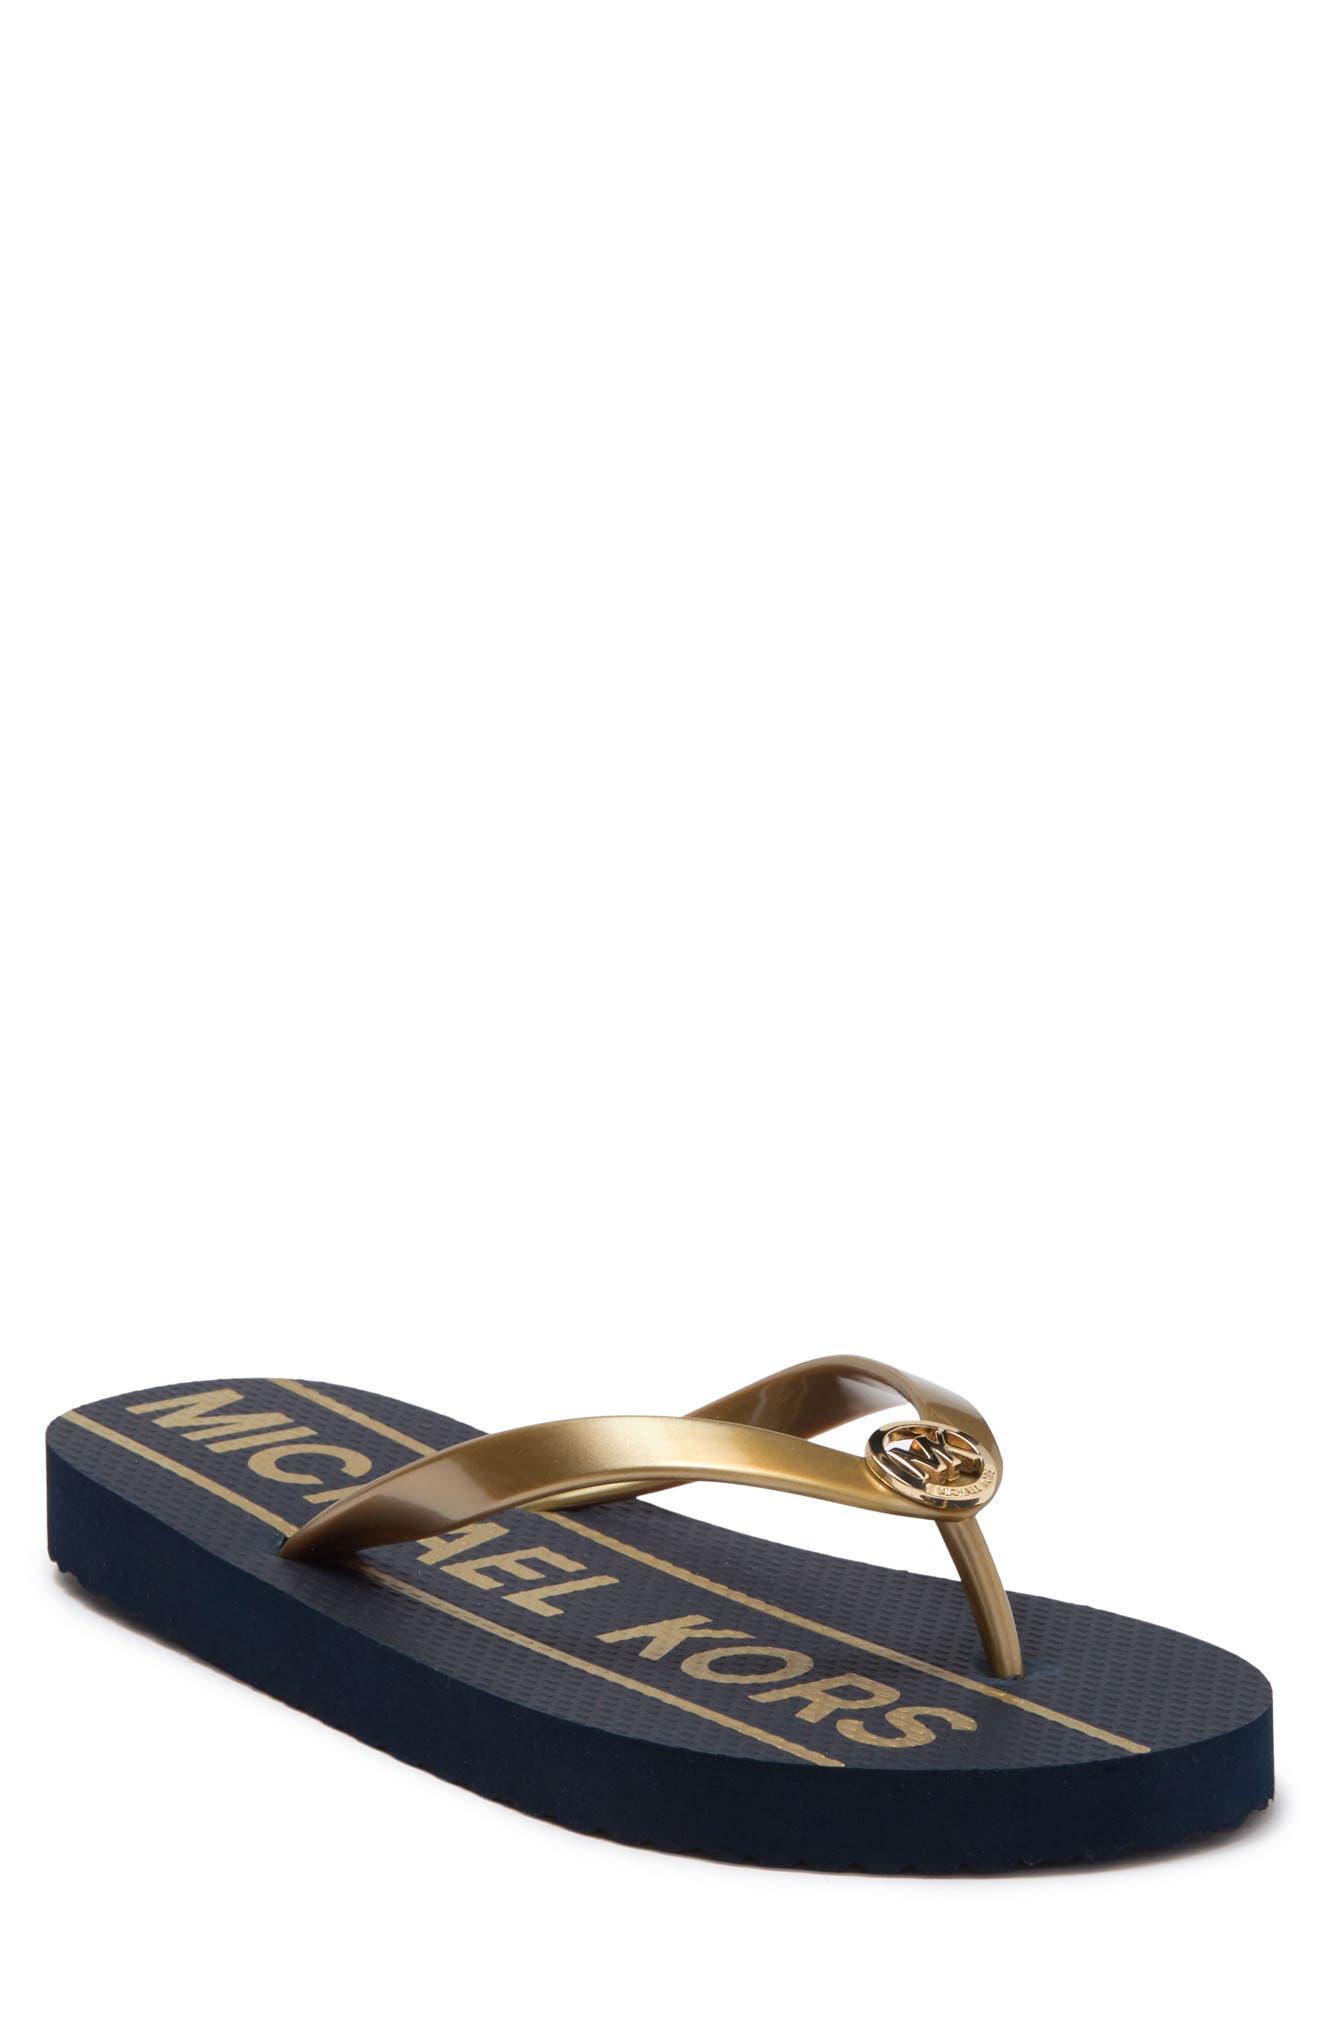 Image of MICHAEL Michael Kors MK Flip Flop